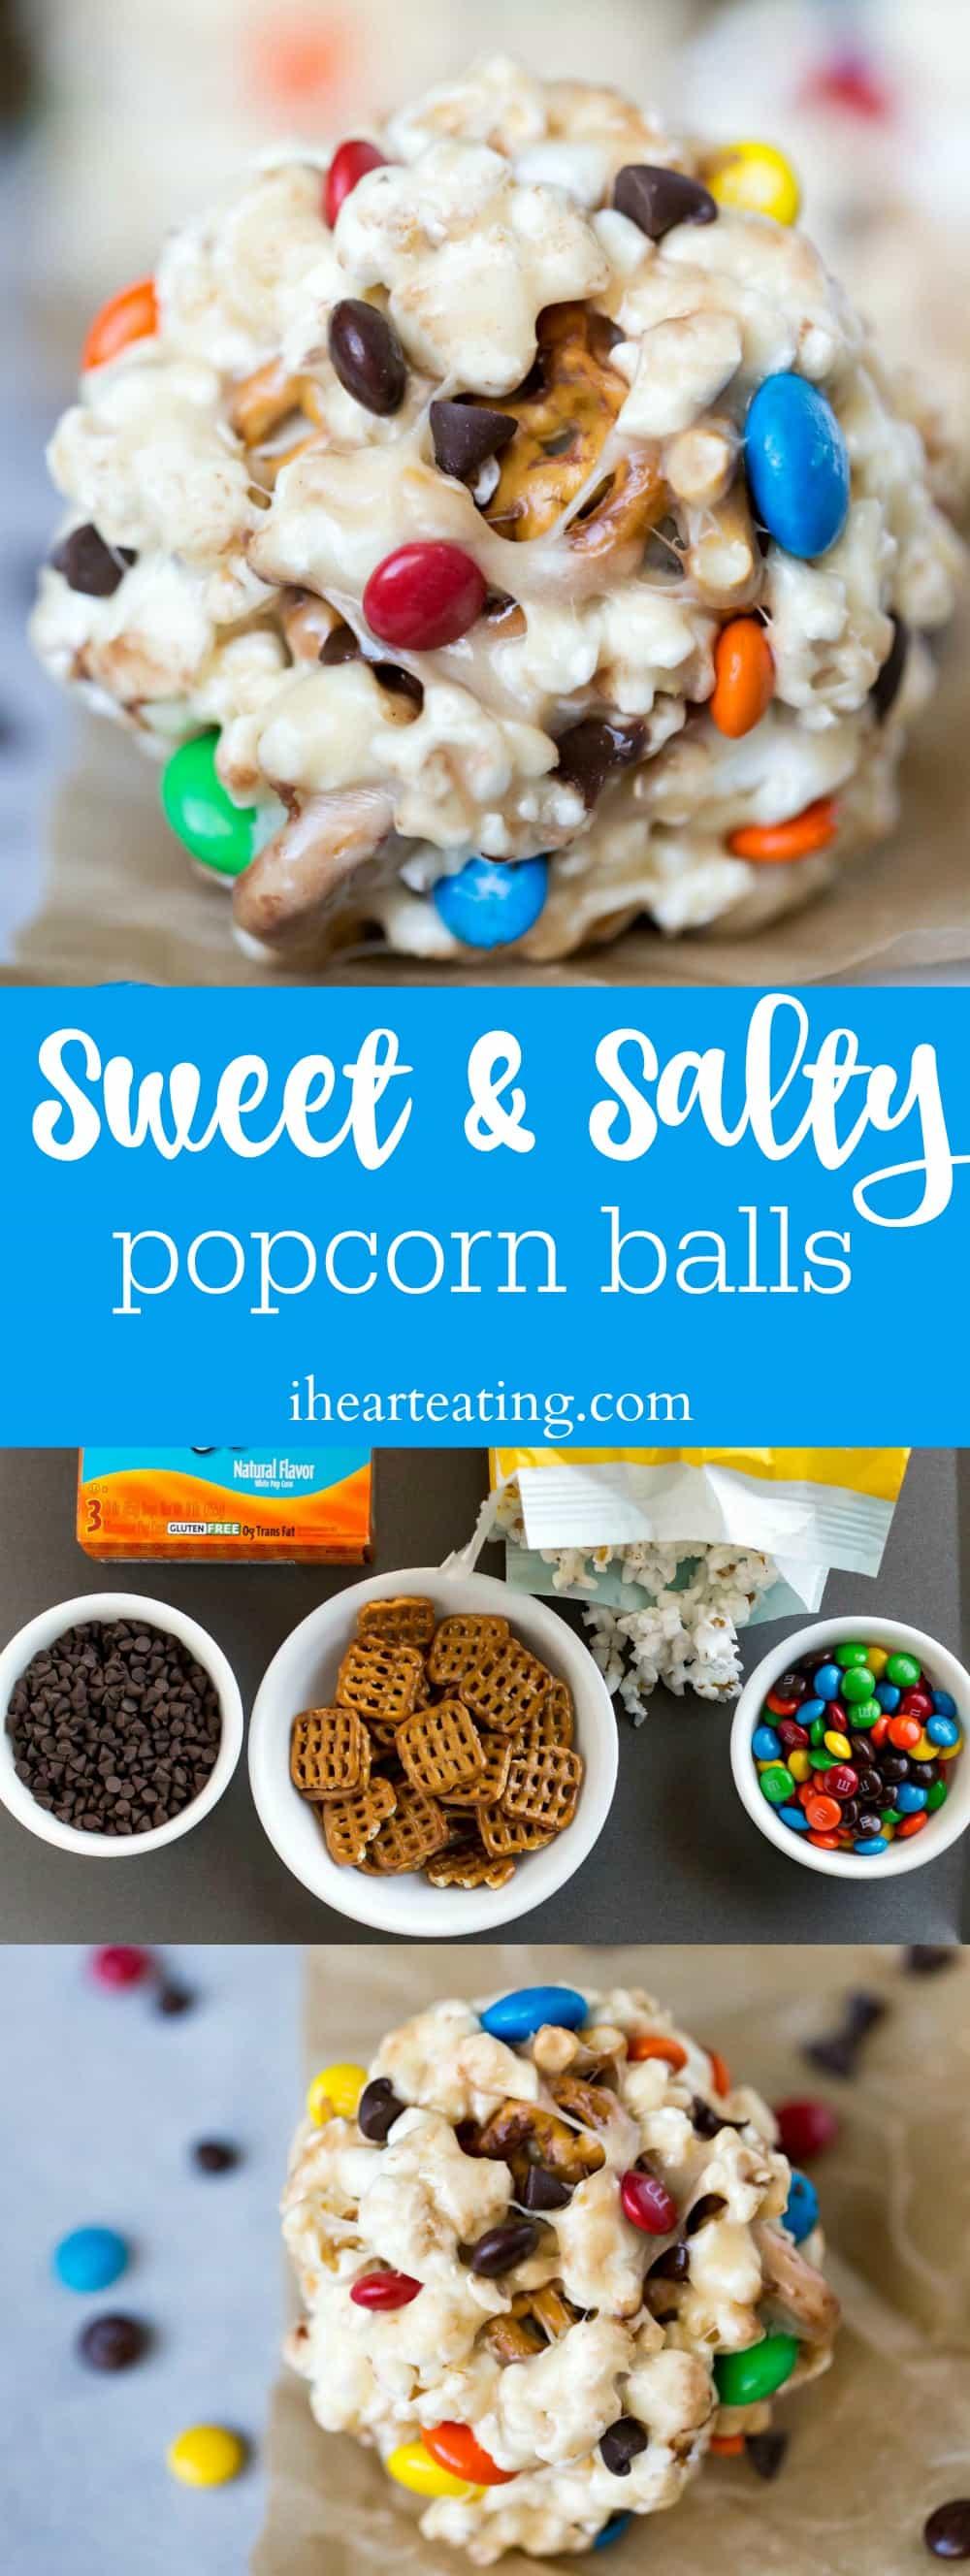 Sweet & Salty Popcorn Ball Recipe